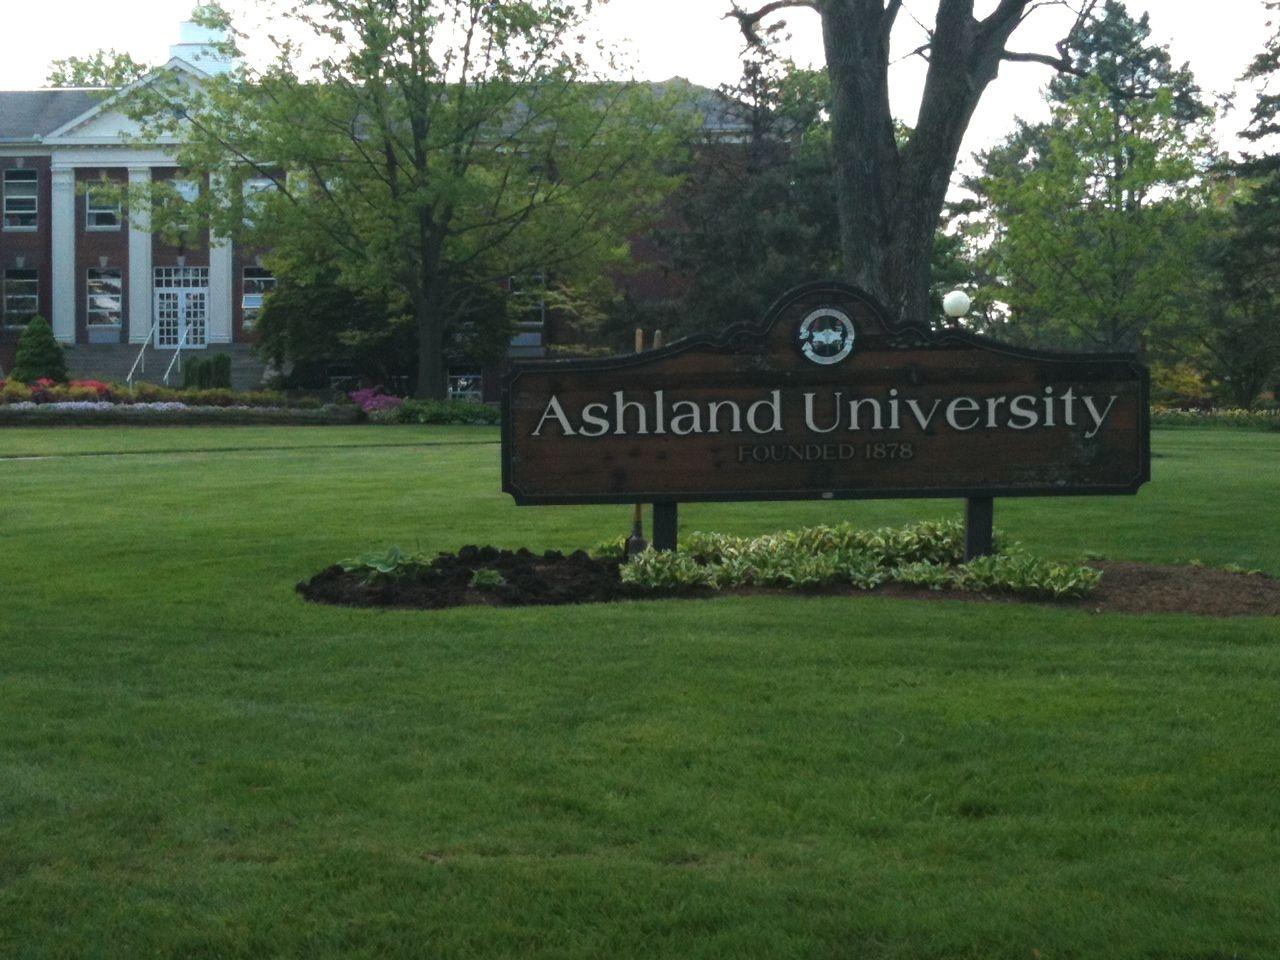 Pin By Irc At Ashland University Library On Ashland University